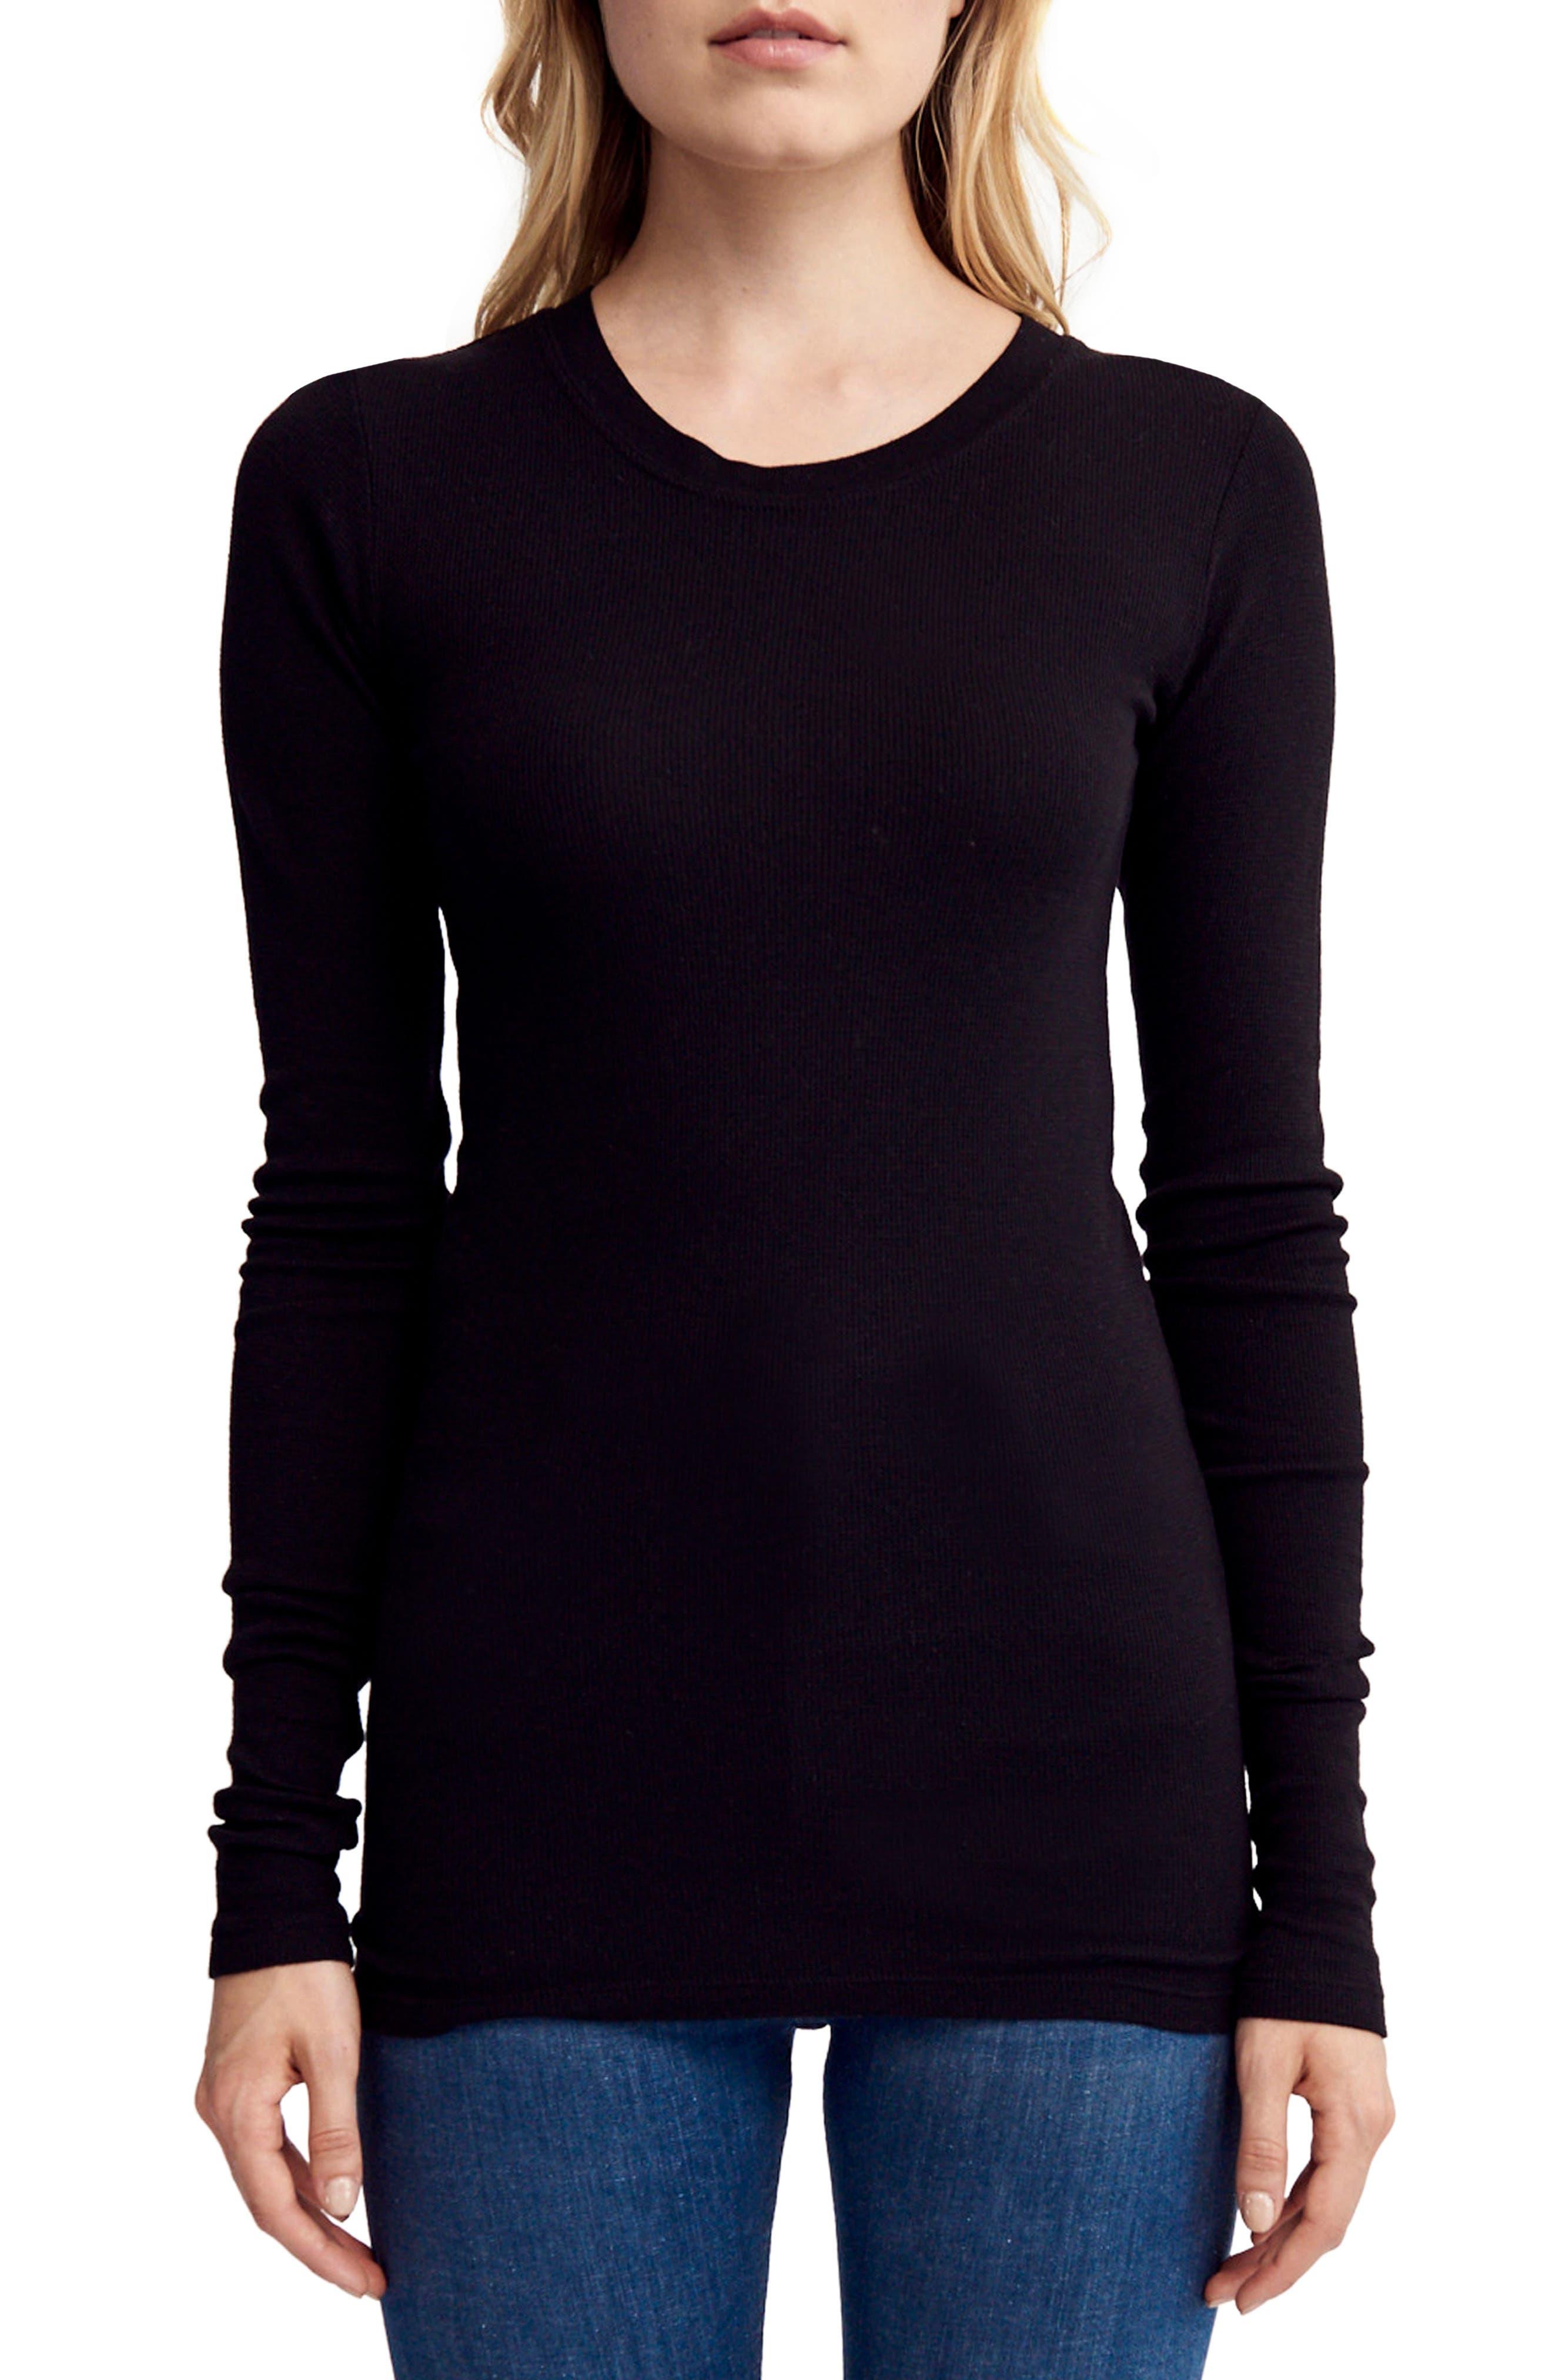 Thermal Knit Top,                         Main,                         color, Black